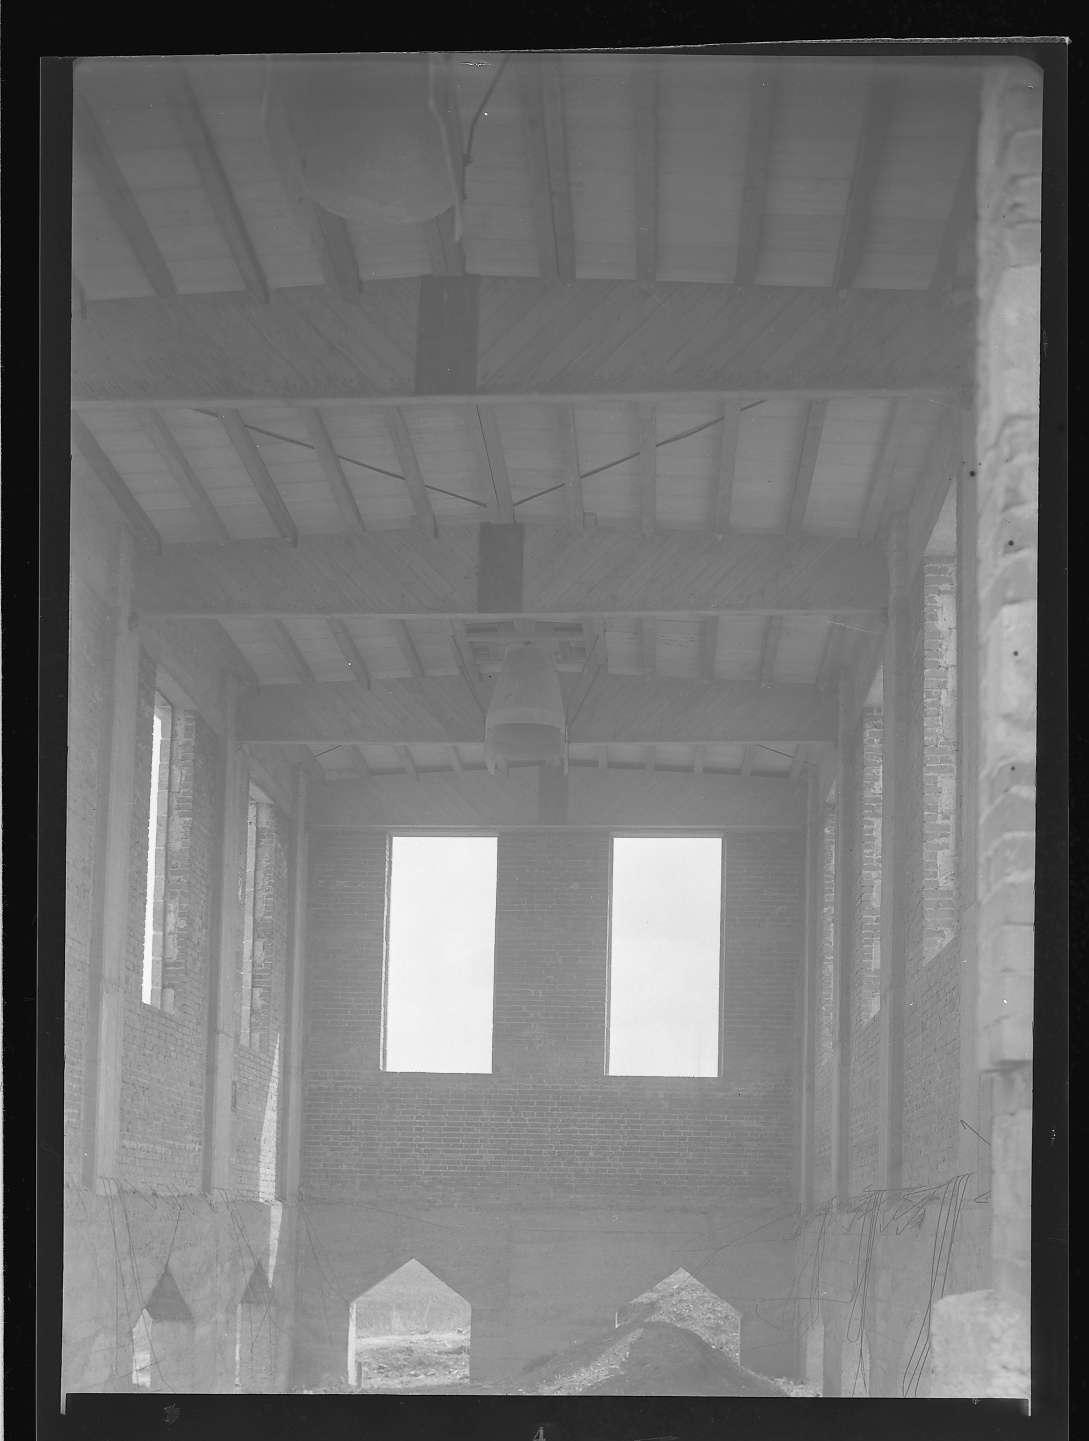 Kirchheim unter Teck, Bf, Rohbau (Innenaufnahme), Bild 1